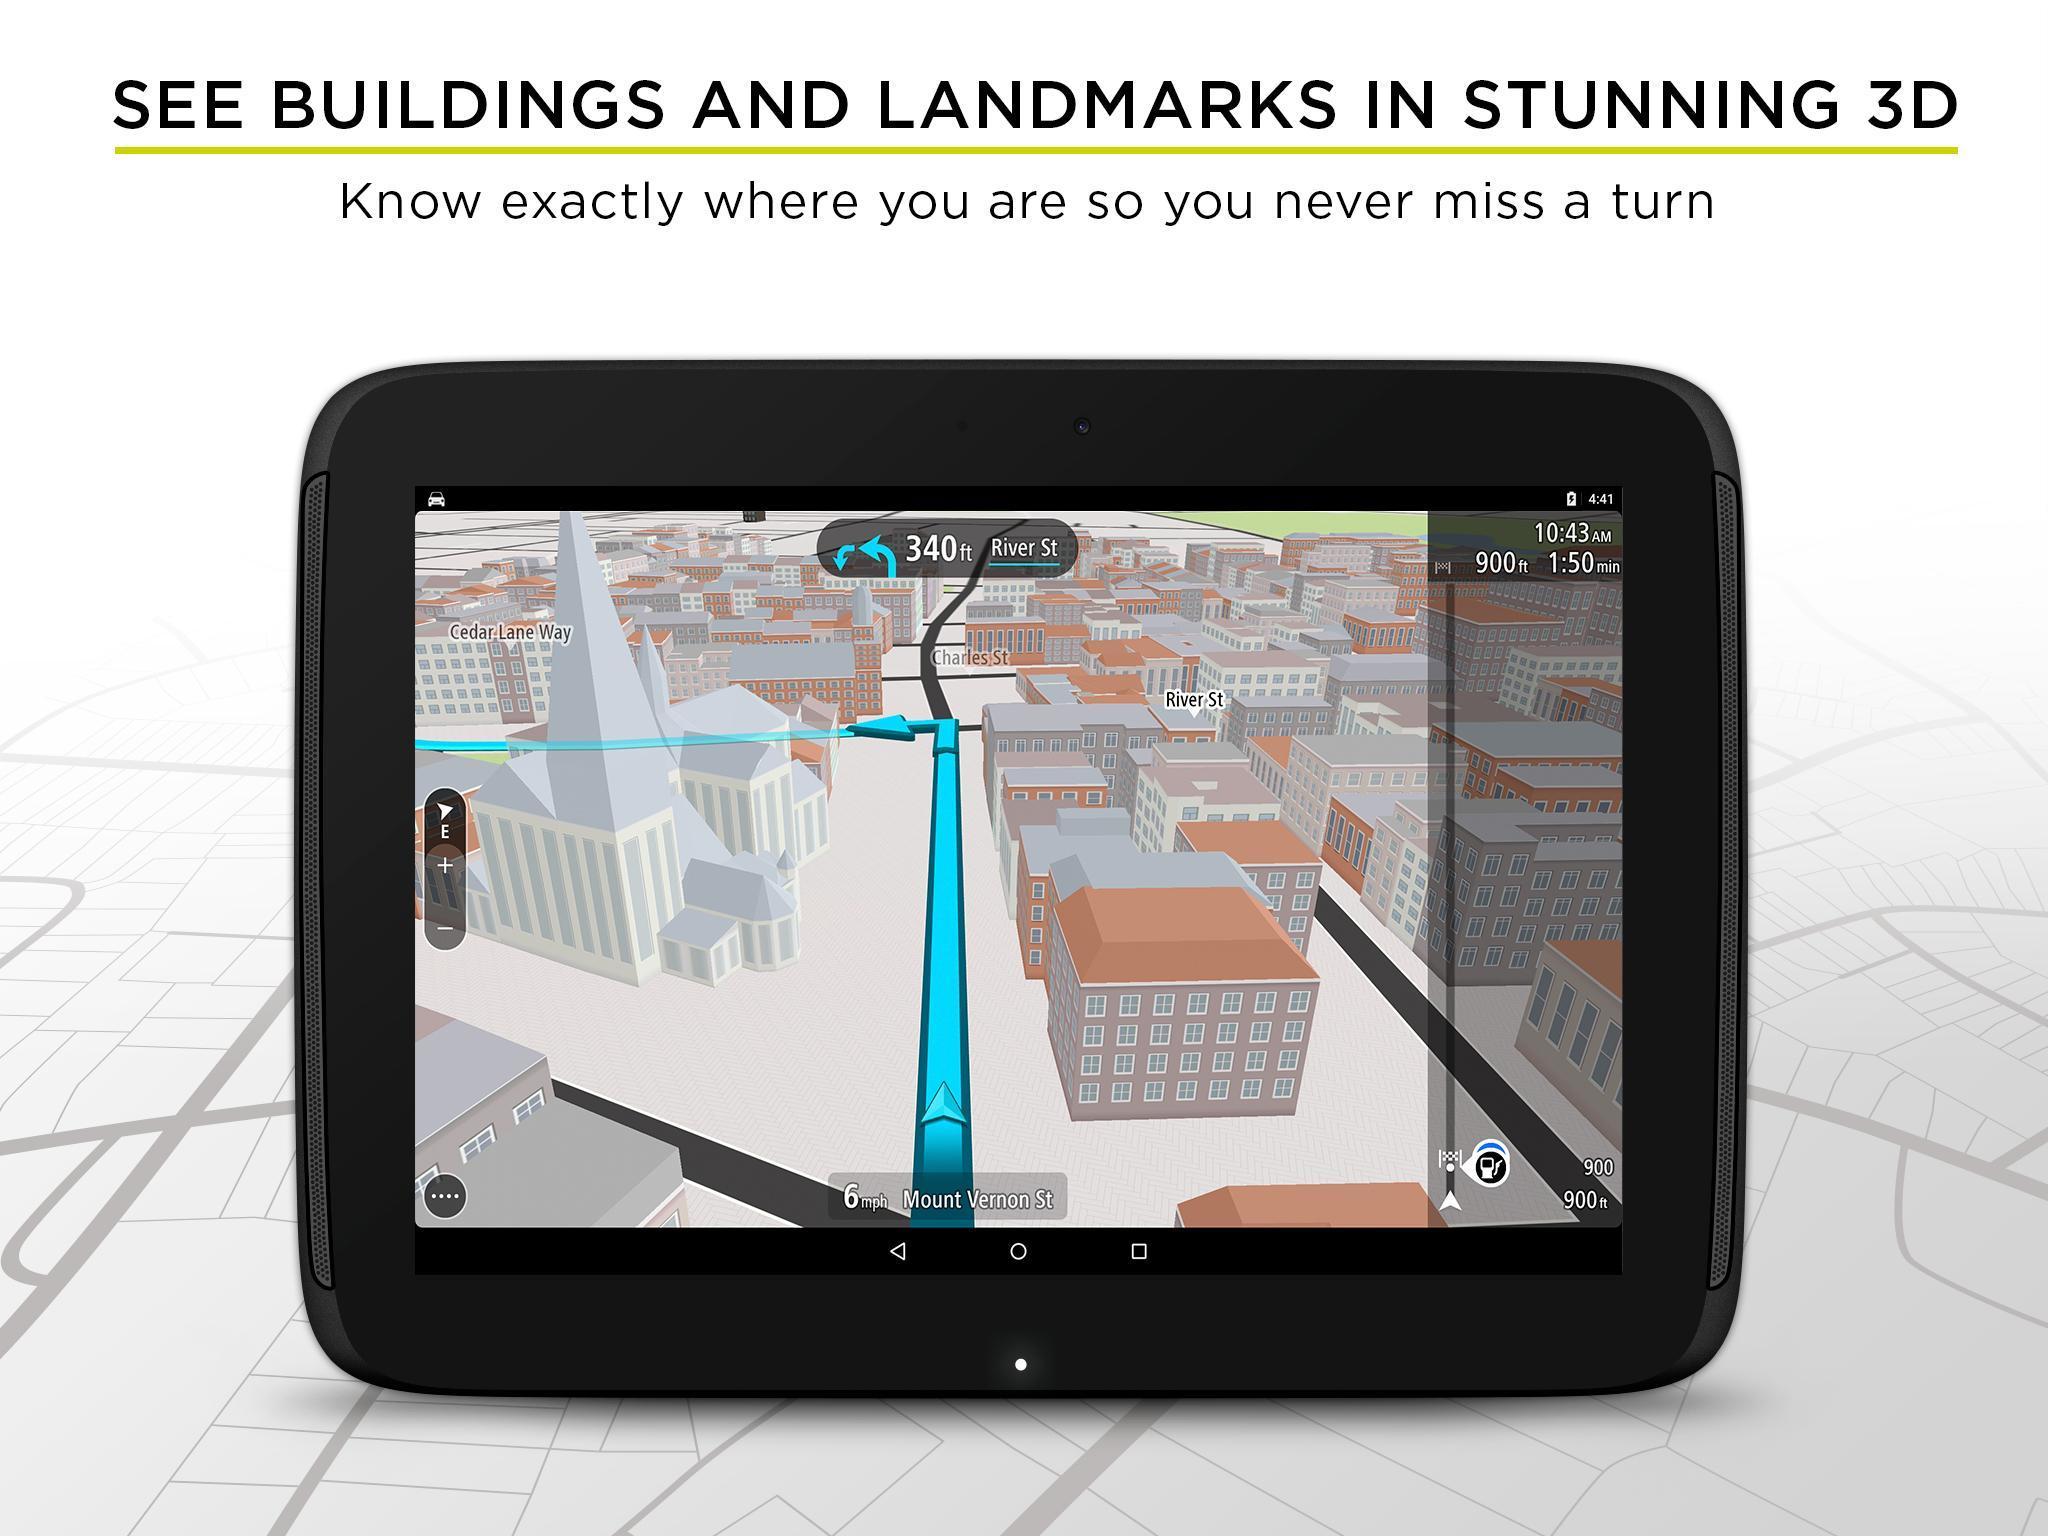 TomTom GPS Navigation - Live Traffic Alerts & Maps 2.0.4 Screenshot 11